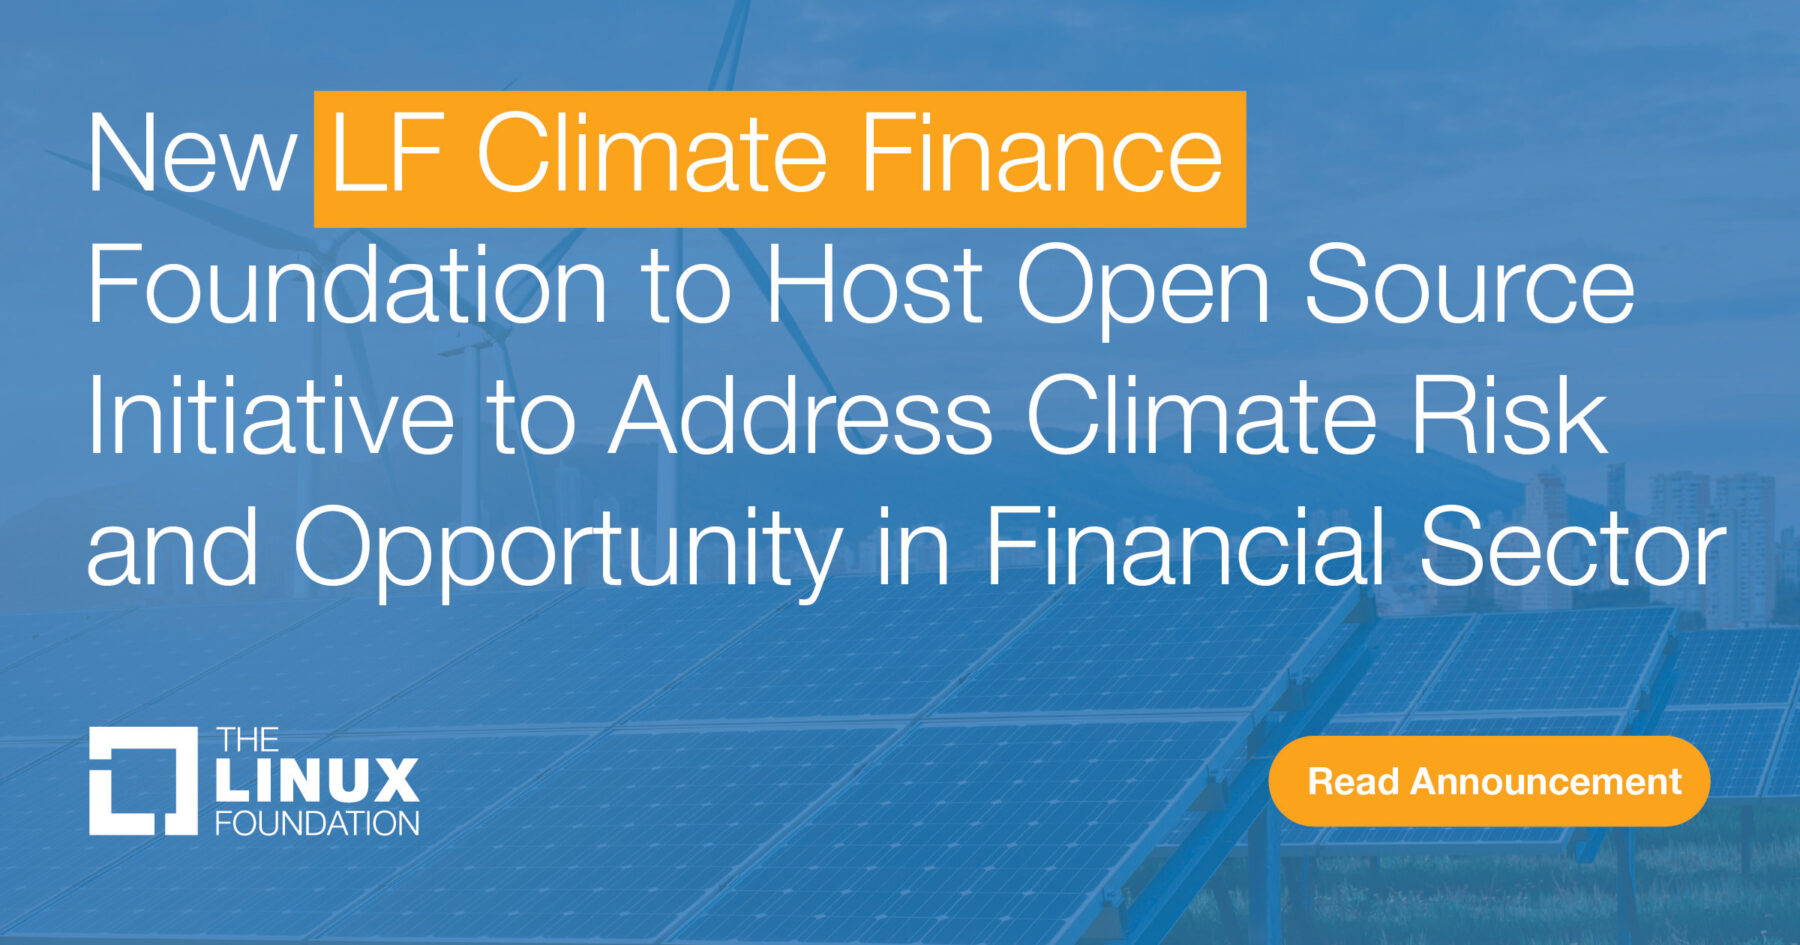 LF Climate Finance Foundation Announced